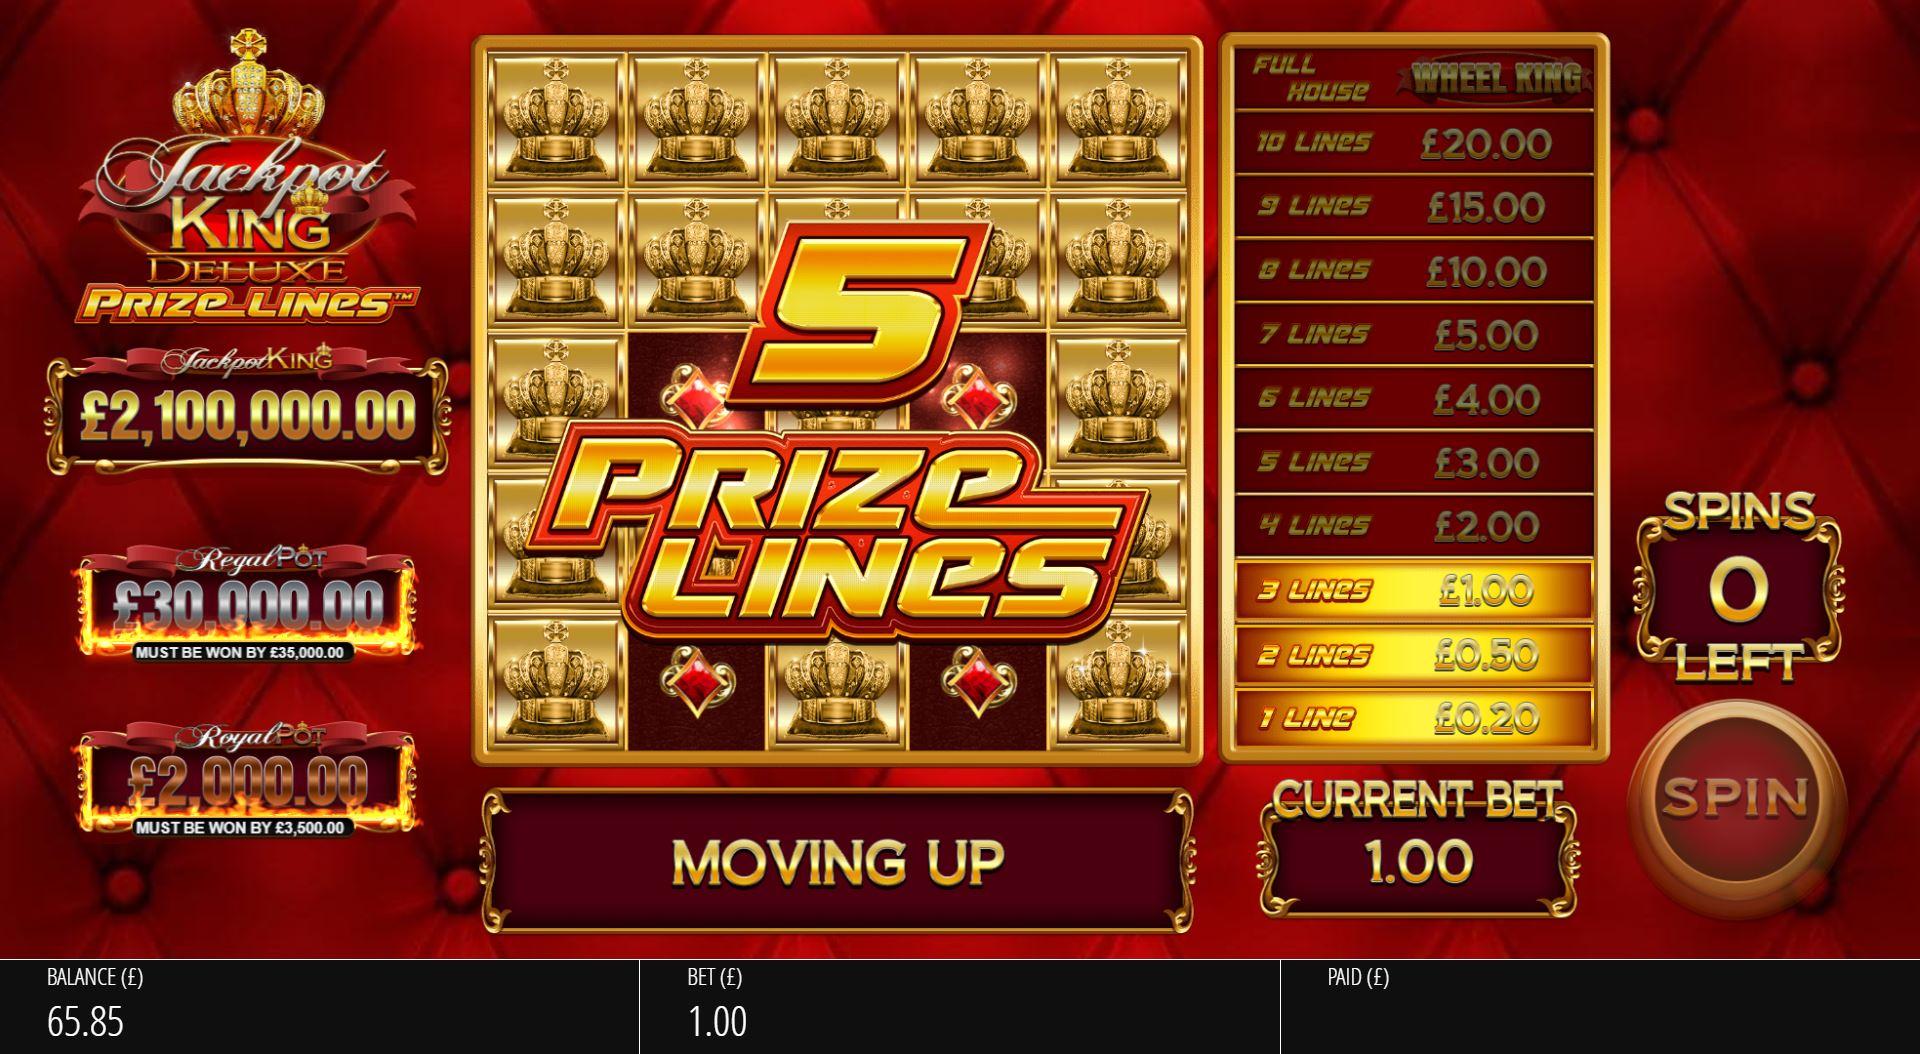 Jackpot King Prize Lines - Base02